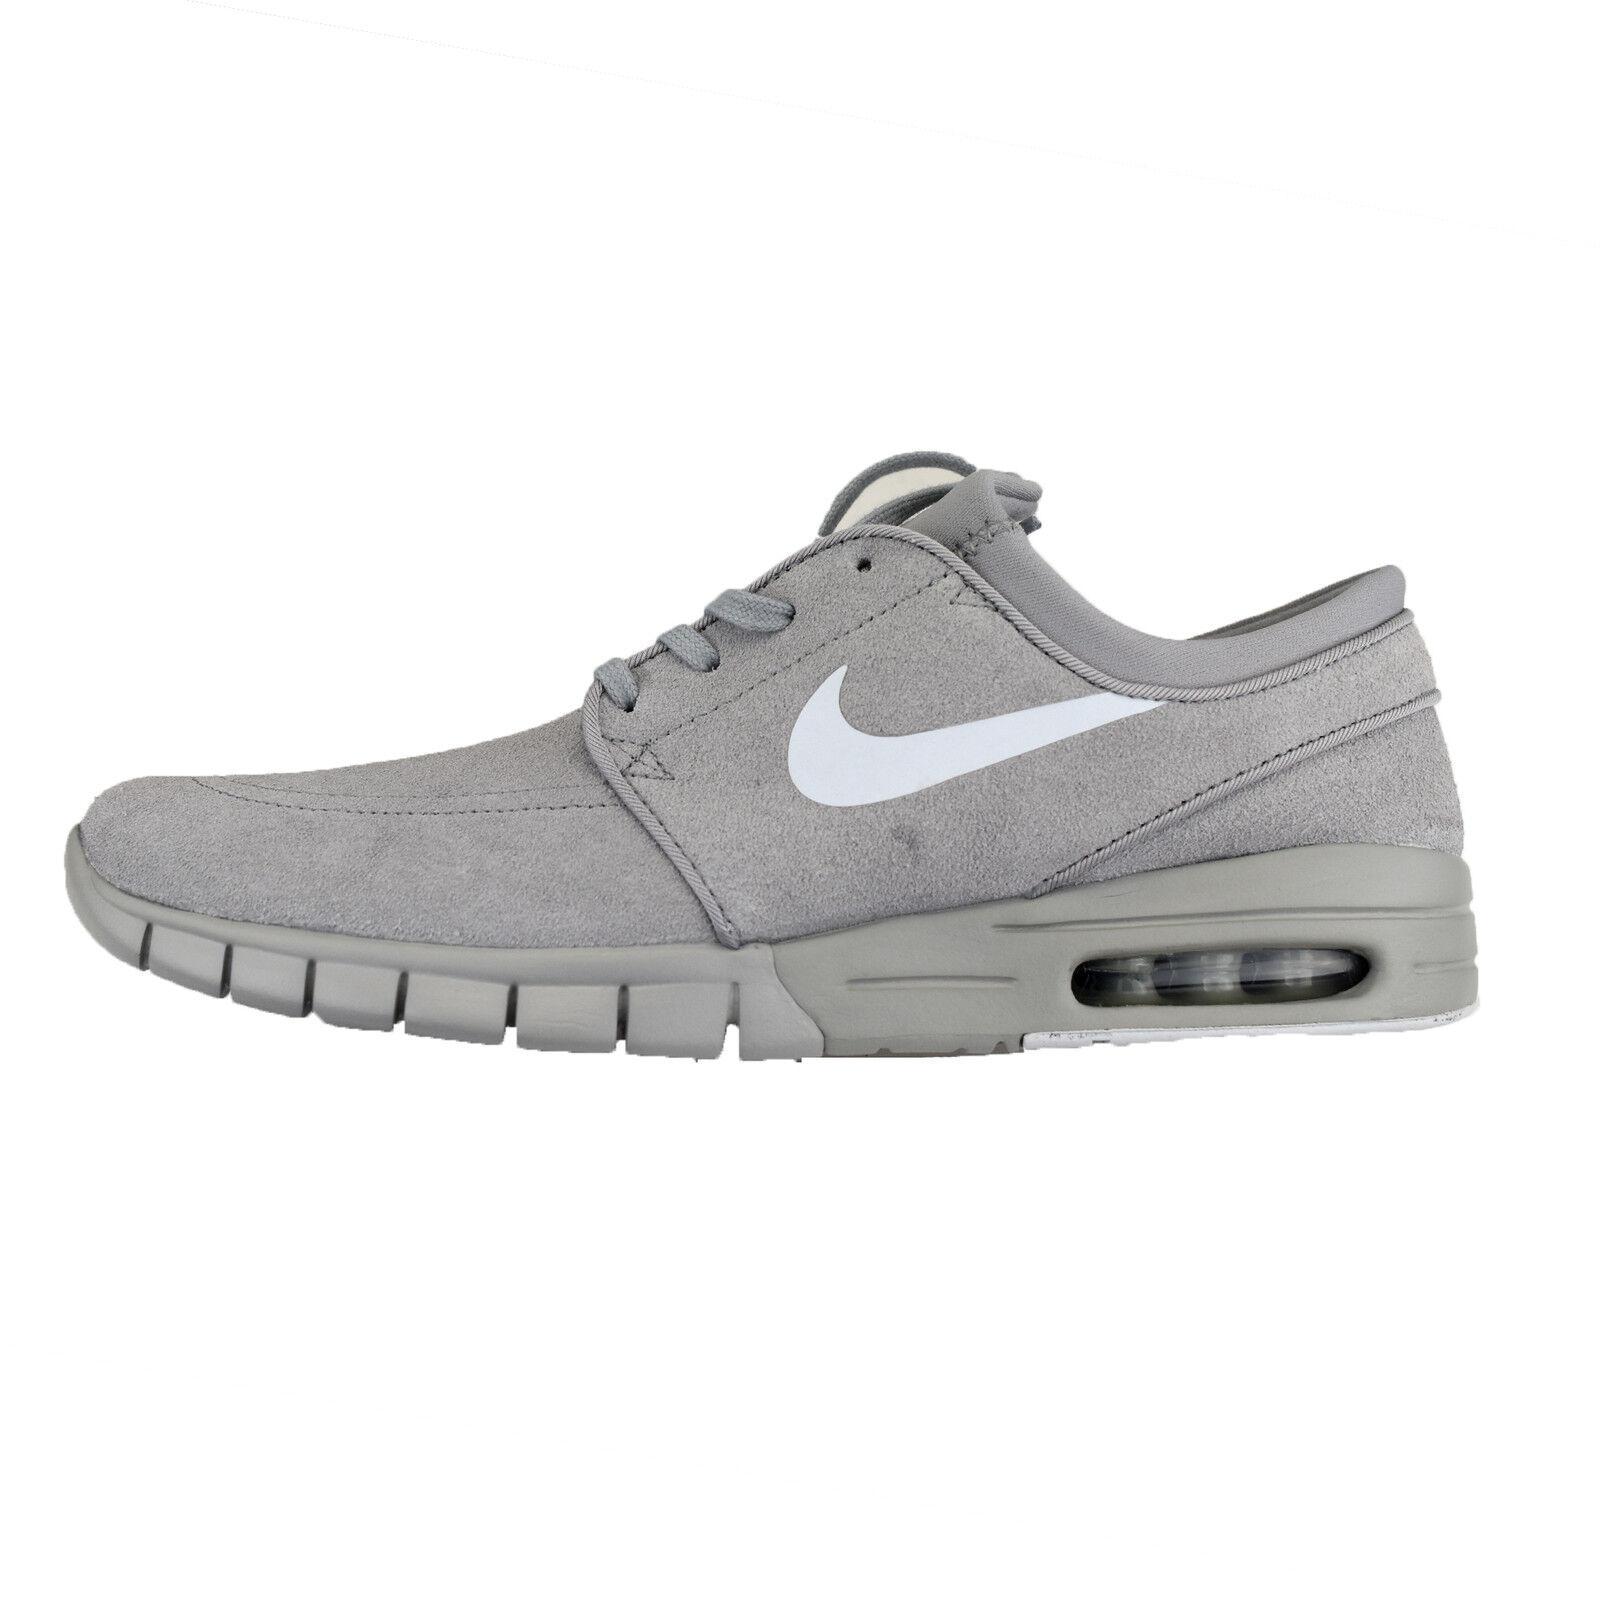 Nike Zoom Stefan Skate Janoski Max L 685299-007 Skate Stefan LIFESTYLE zapato zapatillas 7117f2